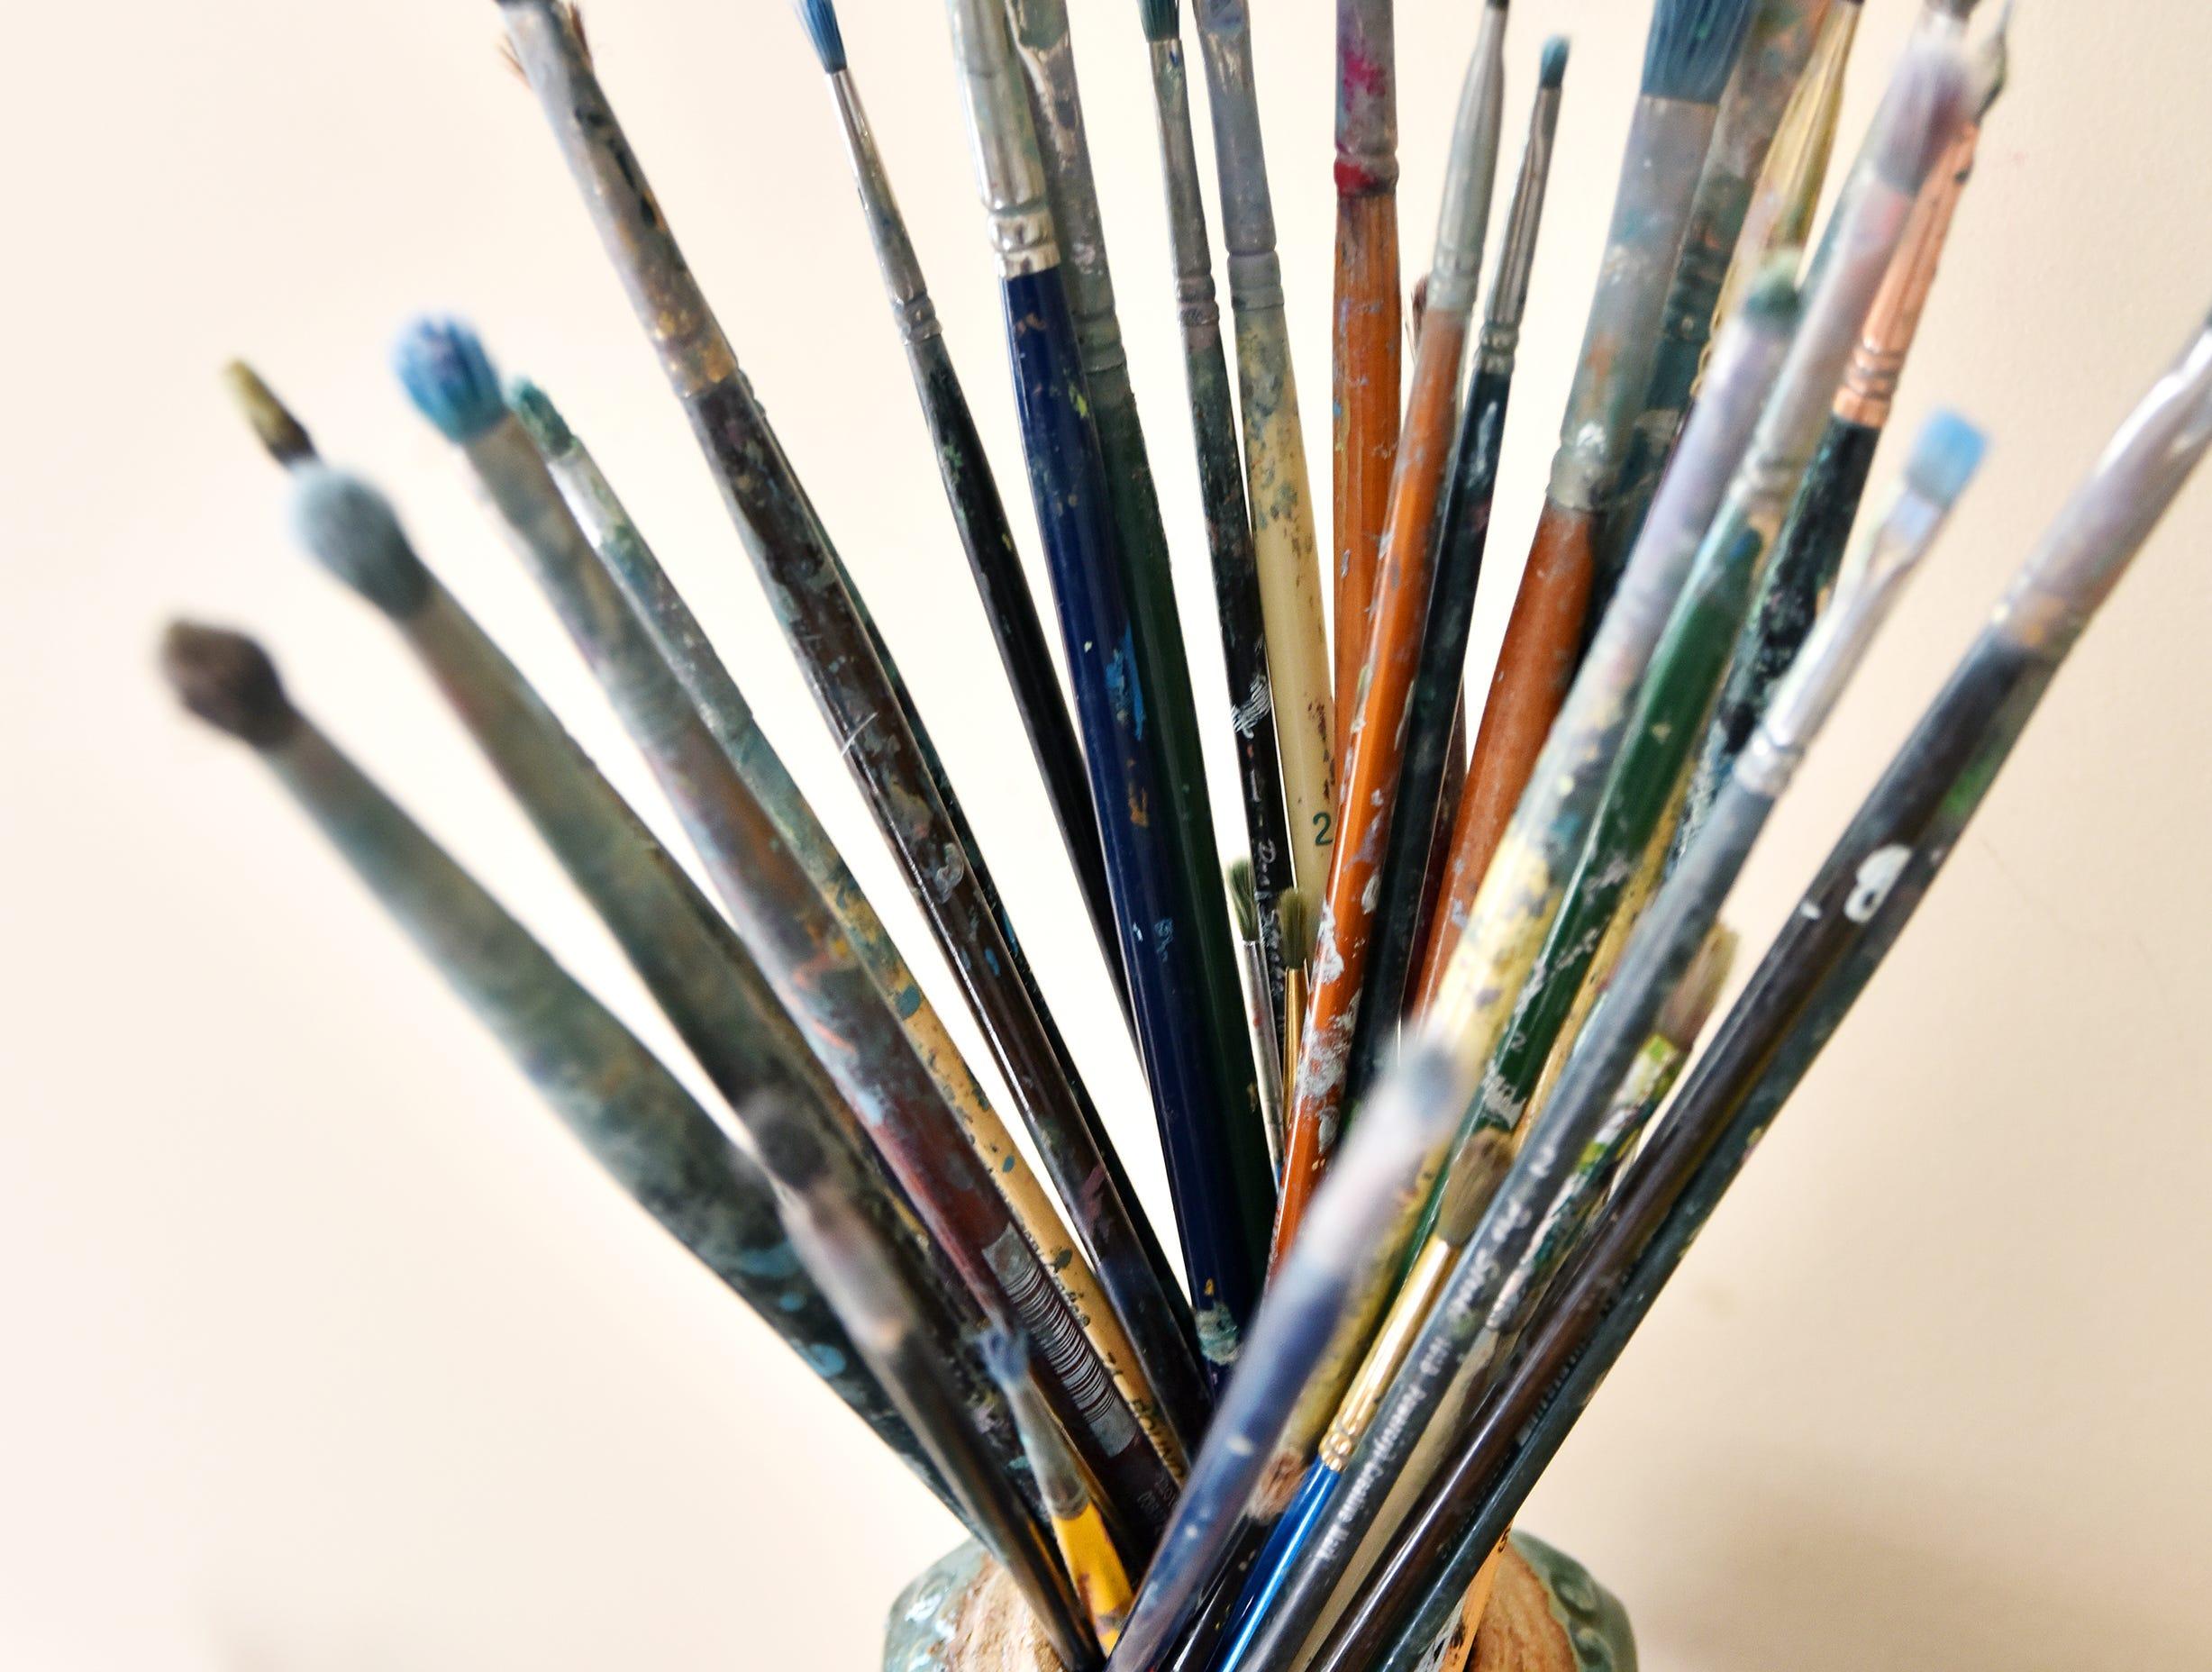 Paintbrushes used by artist Tatyana Grechina